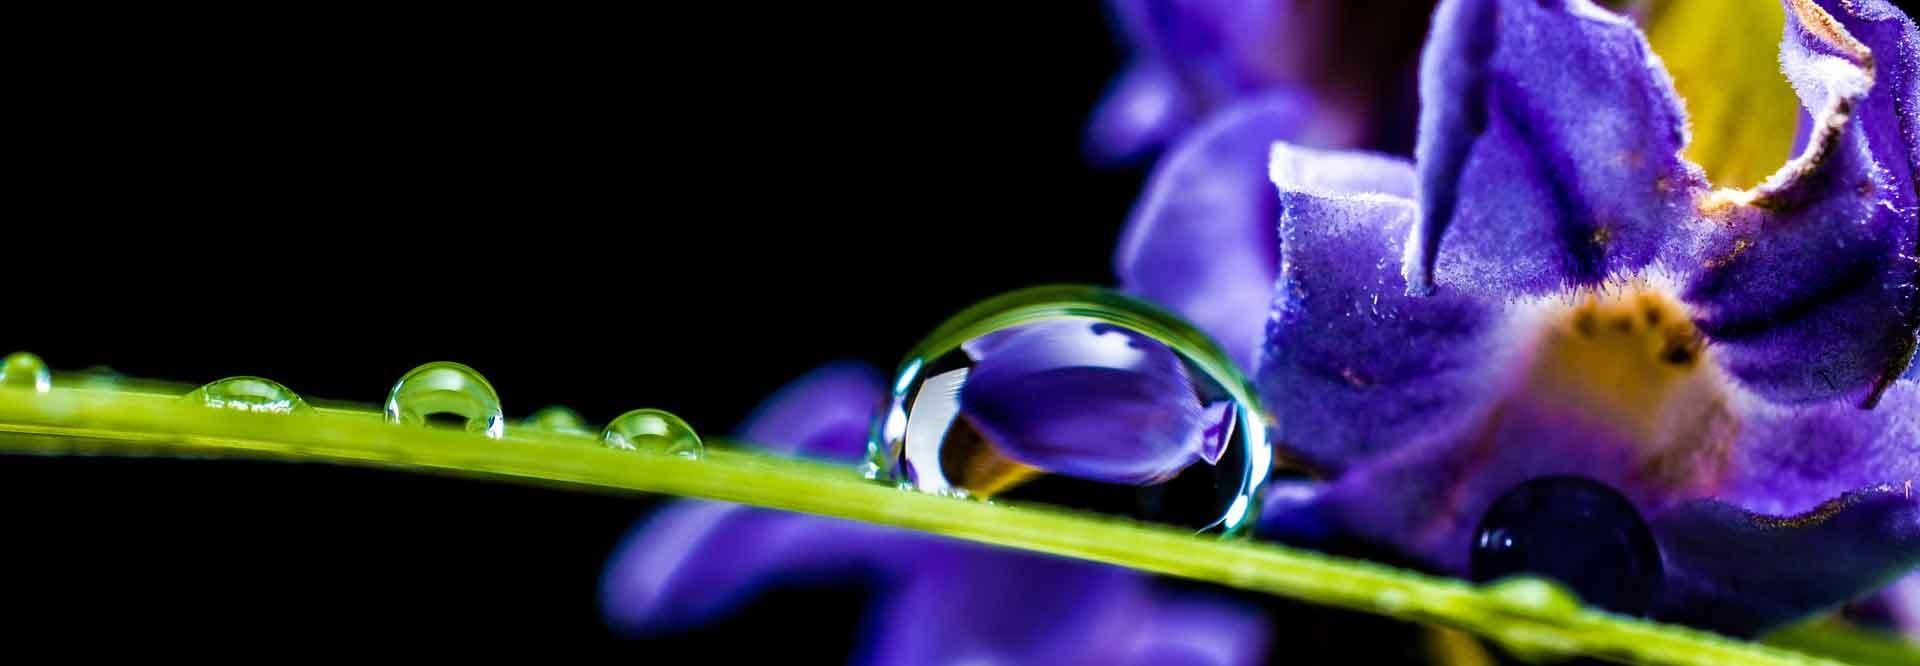 Ätherische Öle. Living Libation, Frei von Gentechnik, synthetischen Düngemitteln, Pestiziden, InsektizideN, HerbizideN